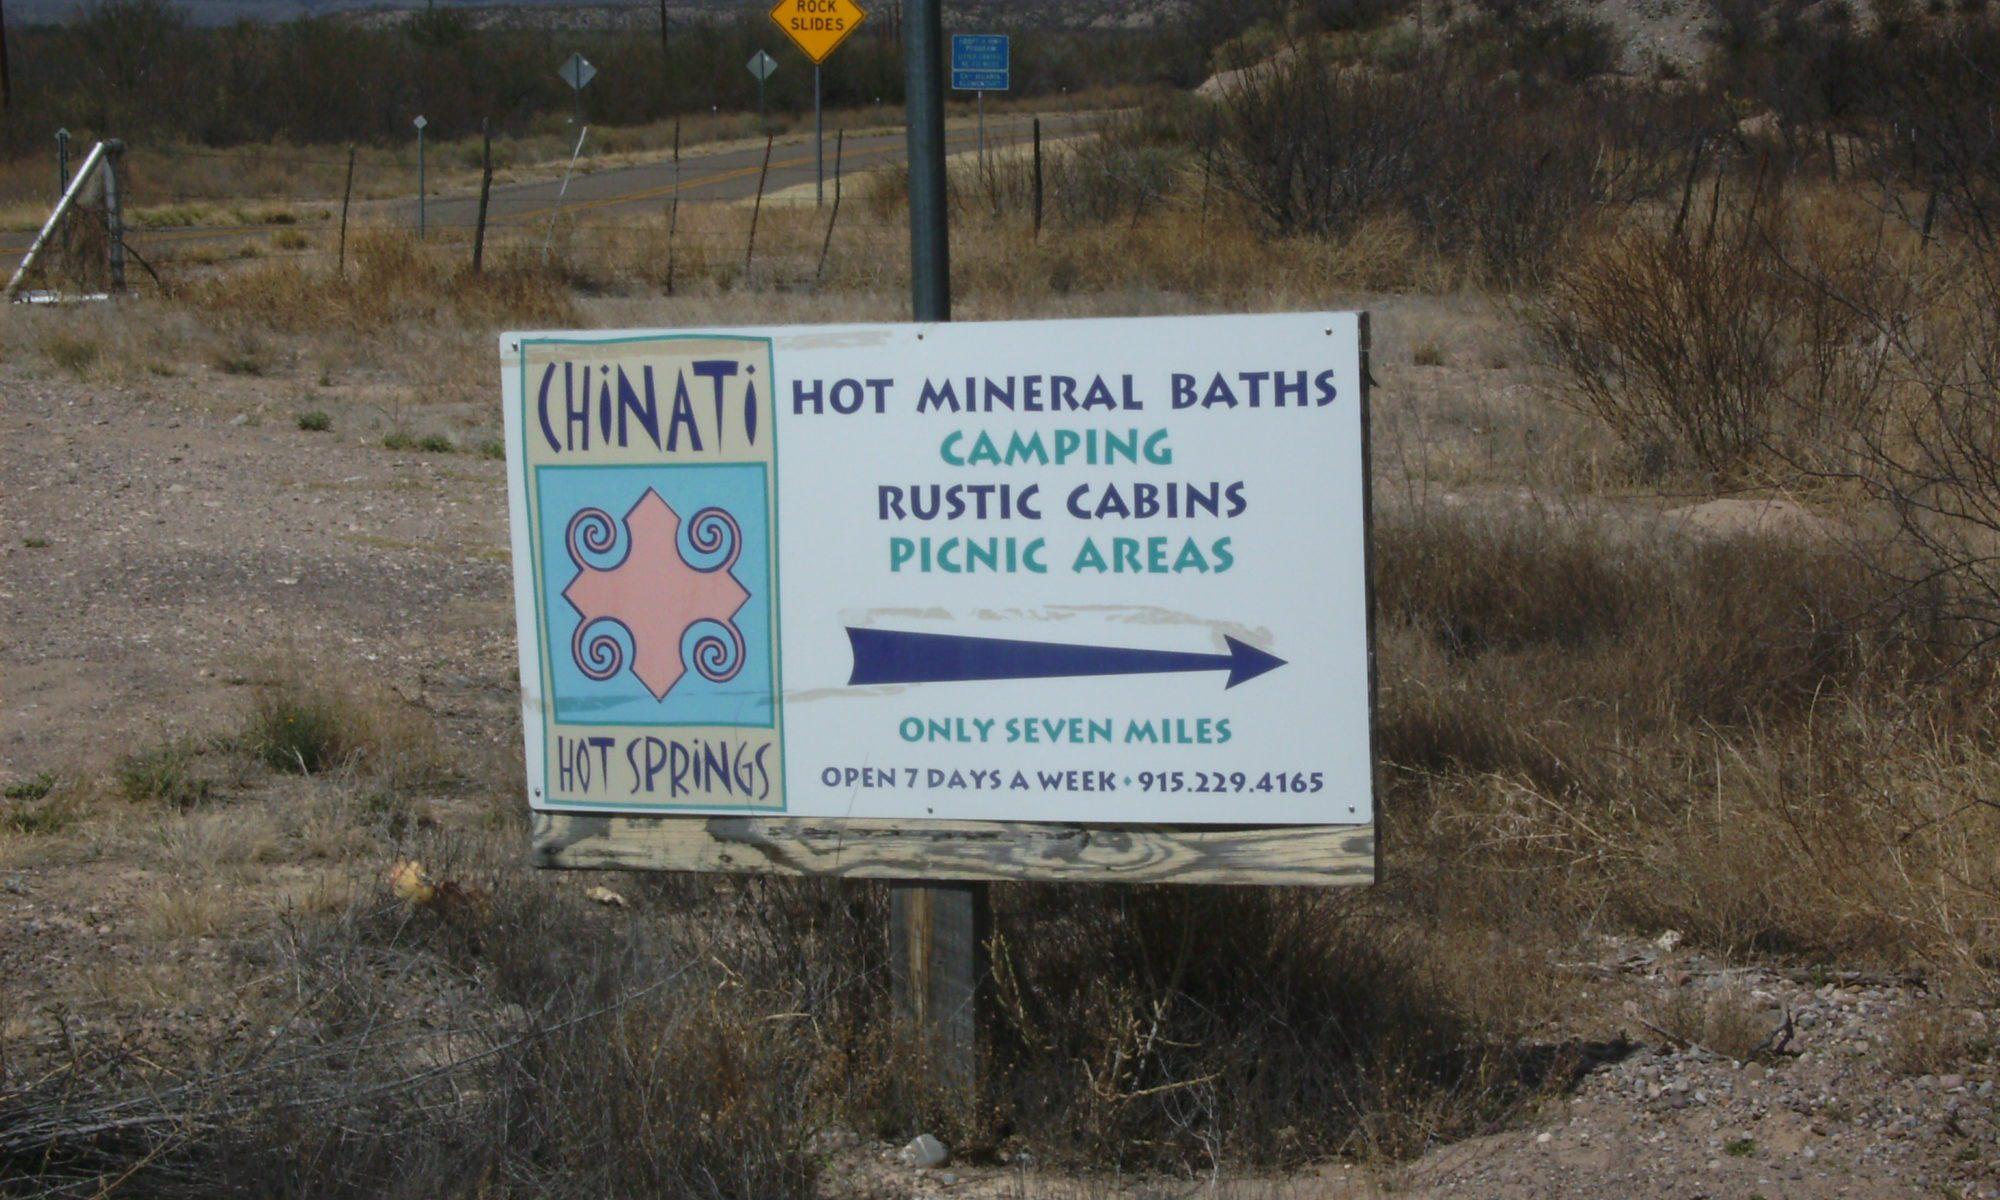 Chinati Hot Springs in Texas